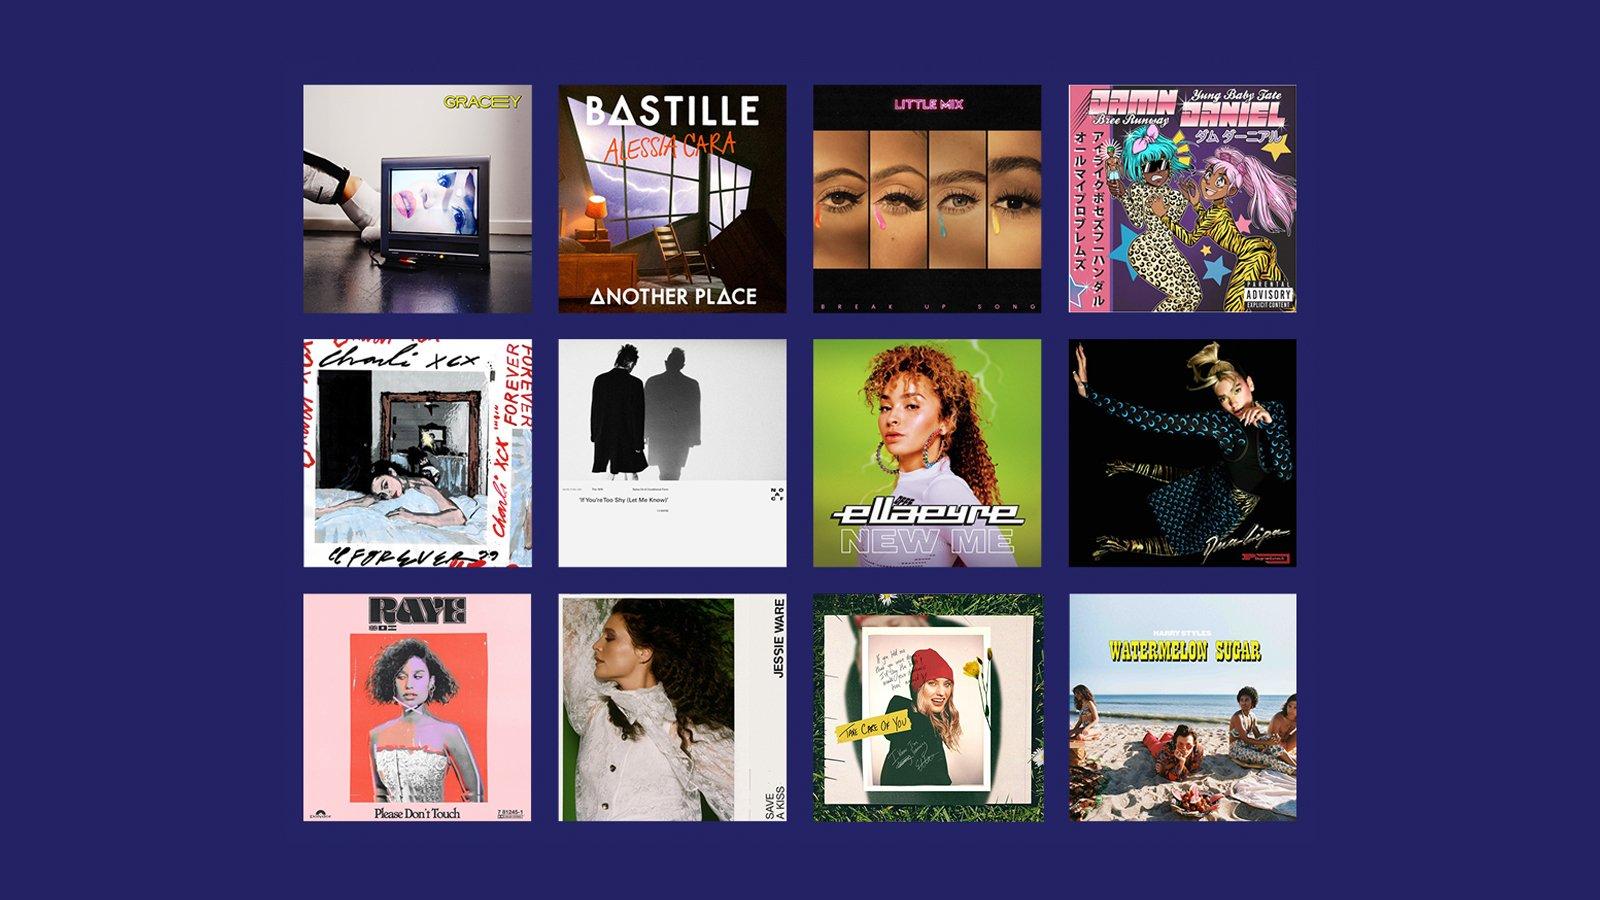 Important announcement: the 2020 Twenty Quid Music Prize shortlist is here